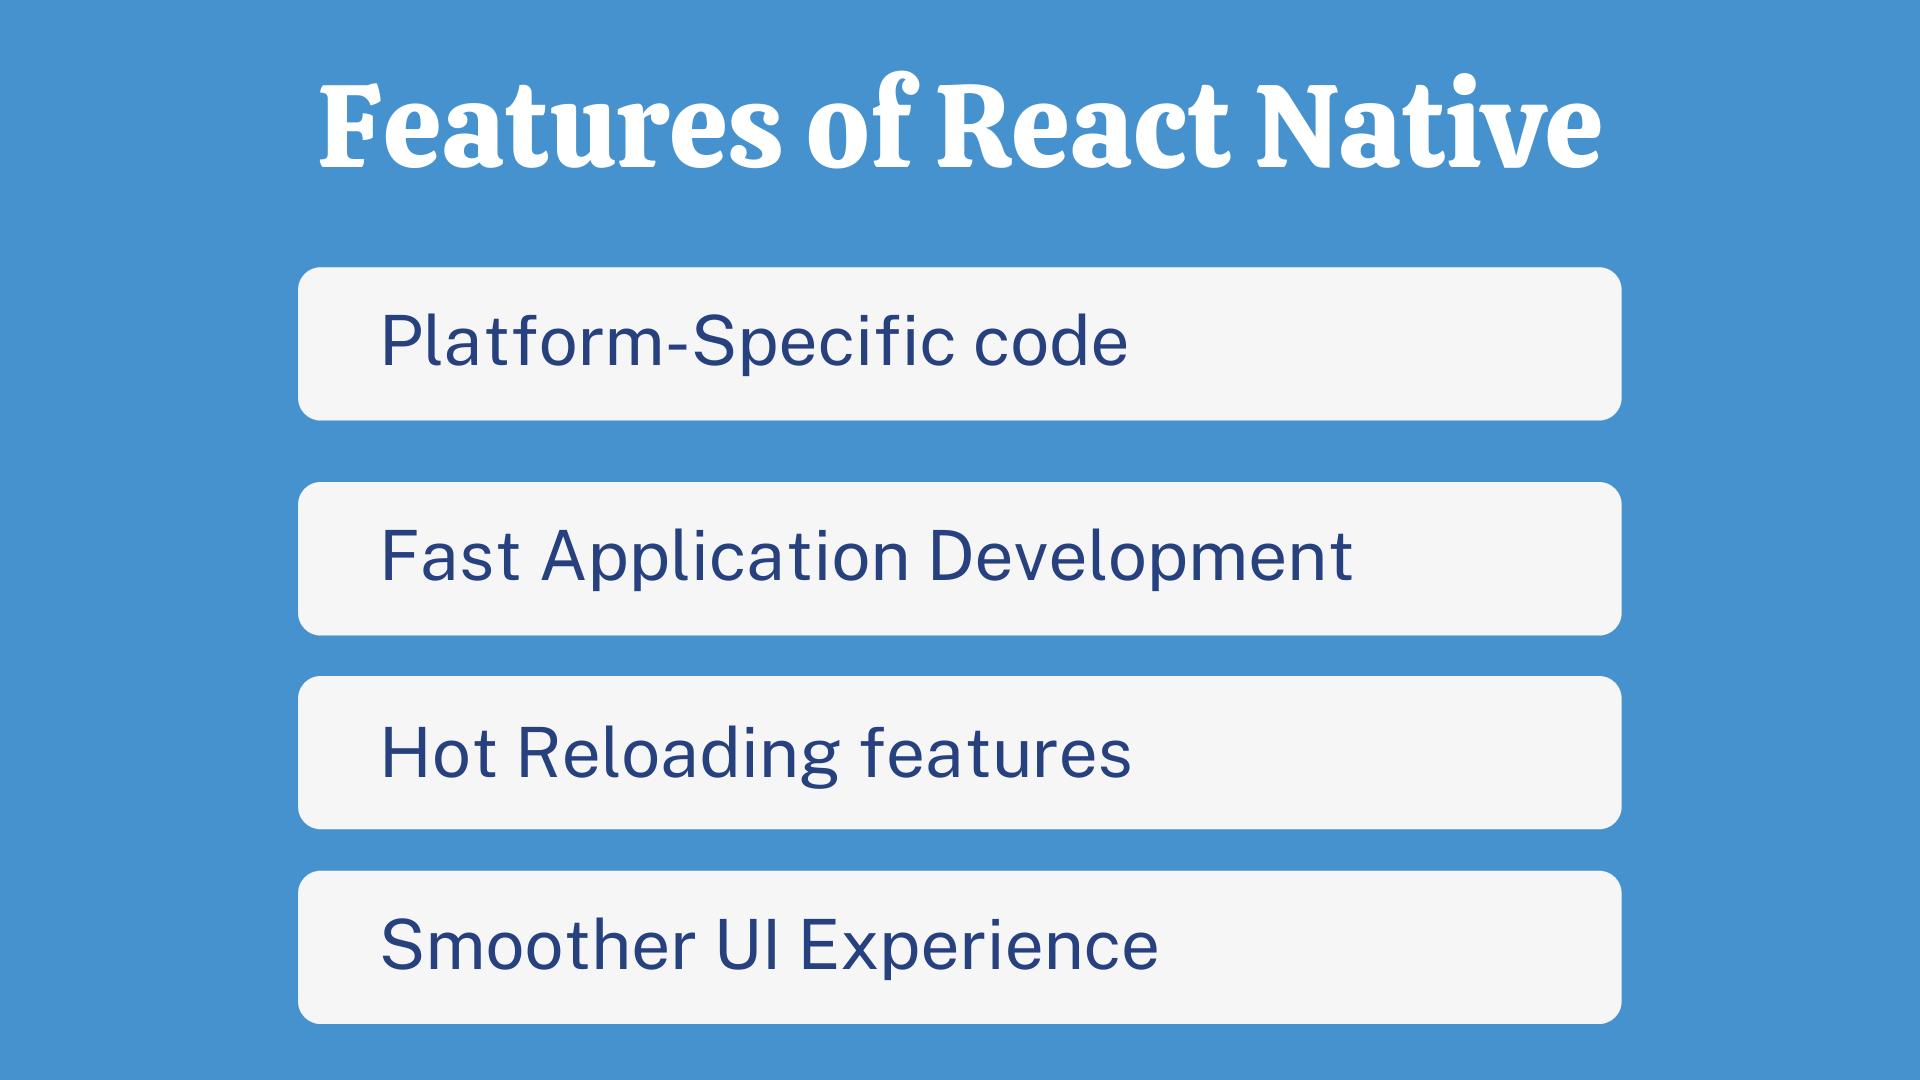 Advantages if using ReactNative